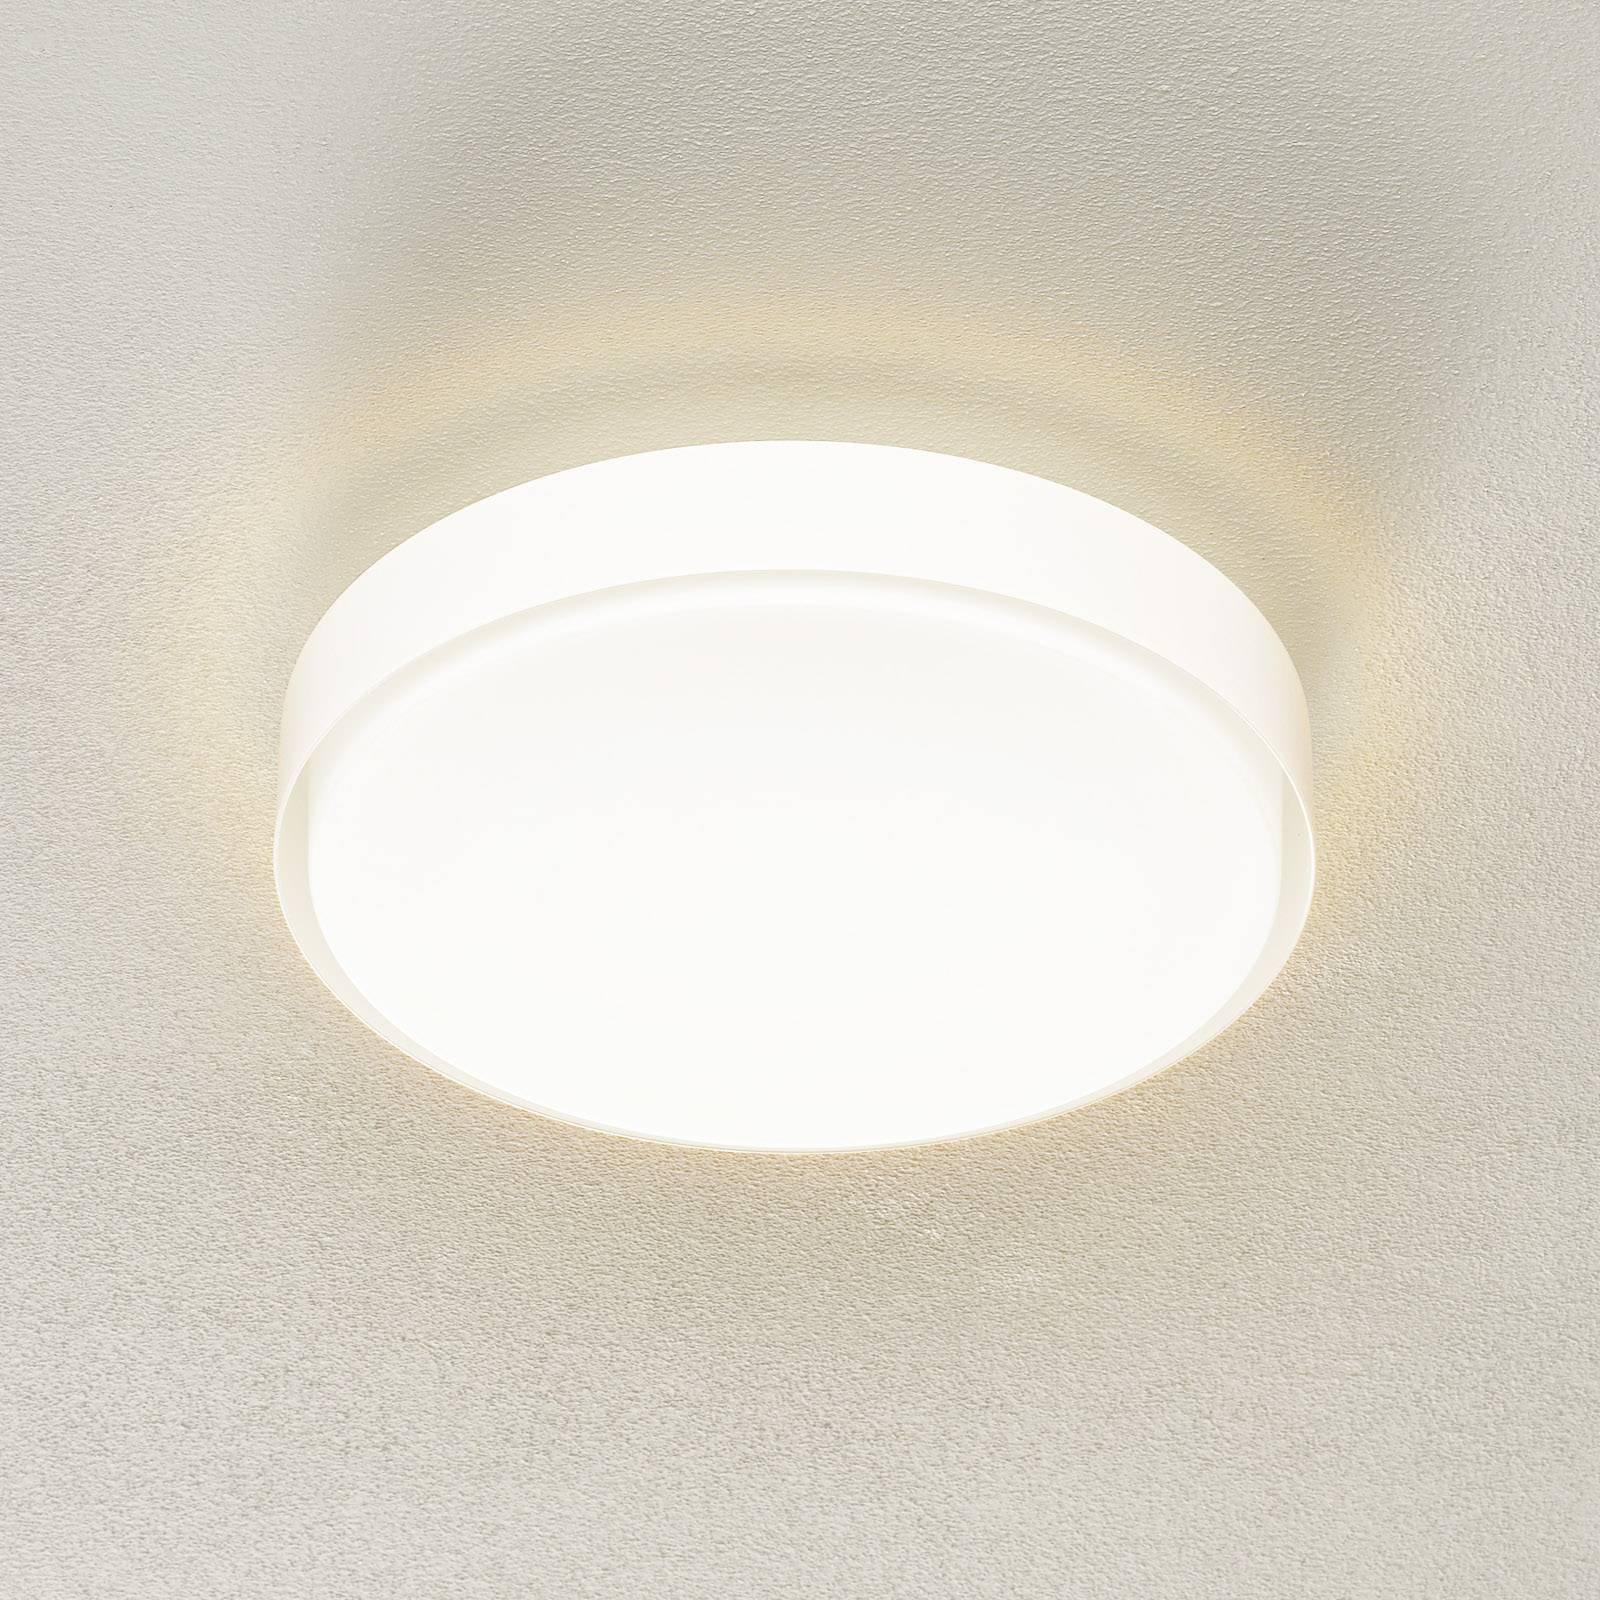 BEGA 34278 LED-taklampe hvit, Ø 36 cm, DALI